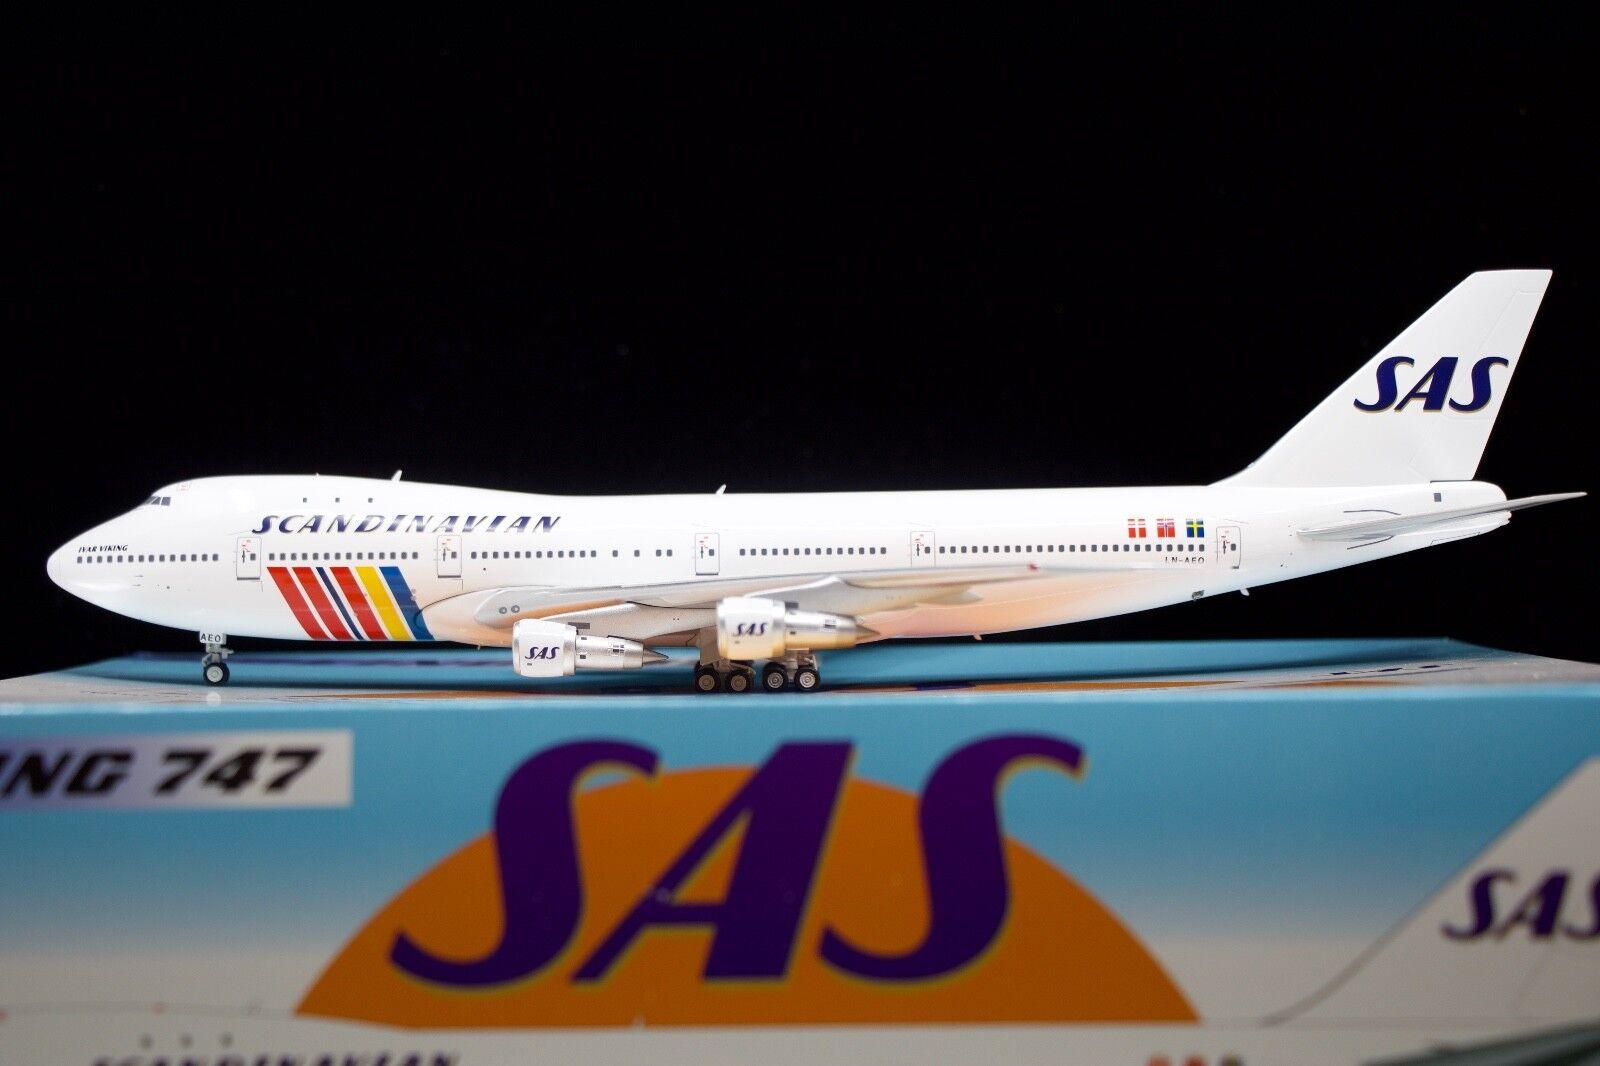 Inflight200 SAS 747-200 'Ivar Viking' LN-AEO